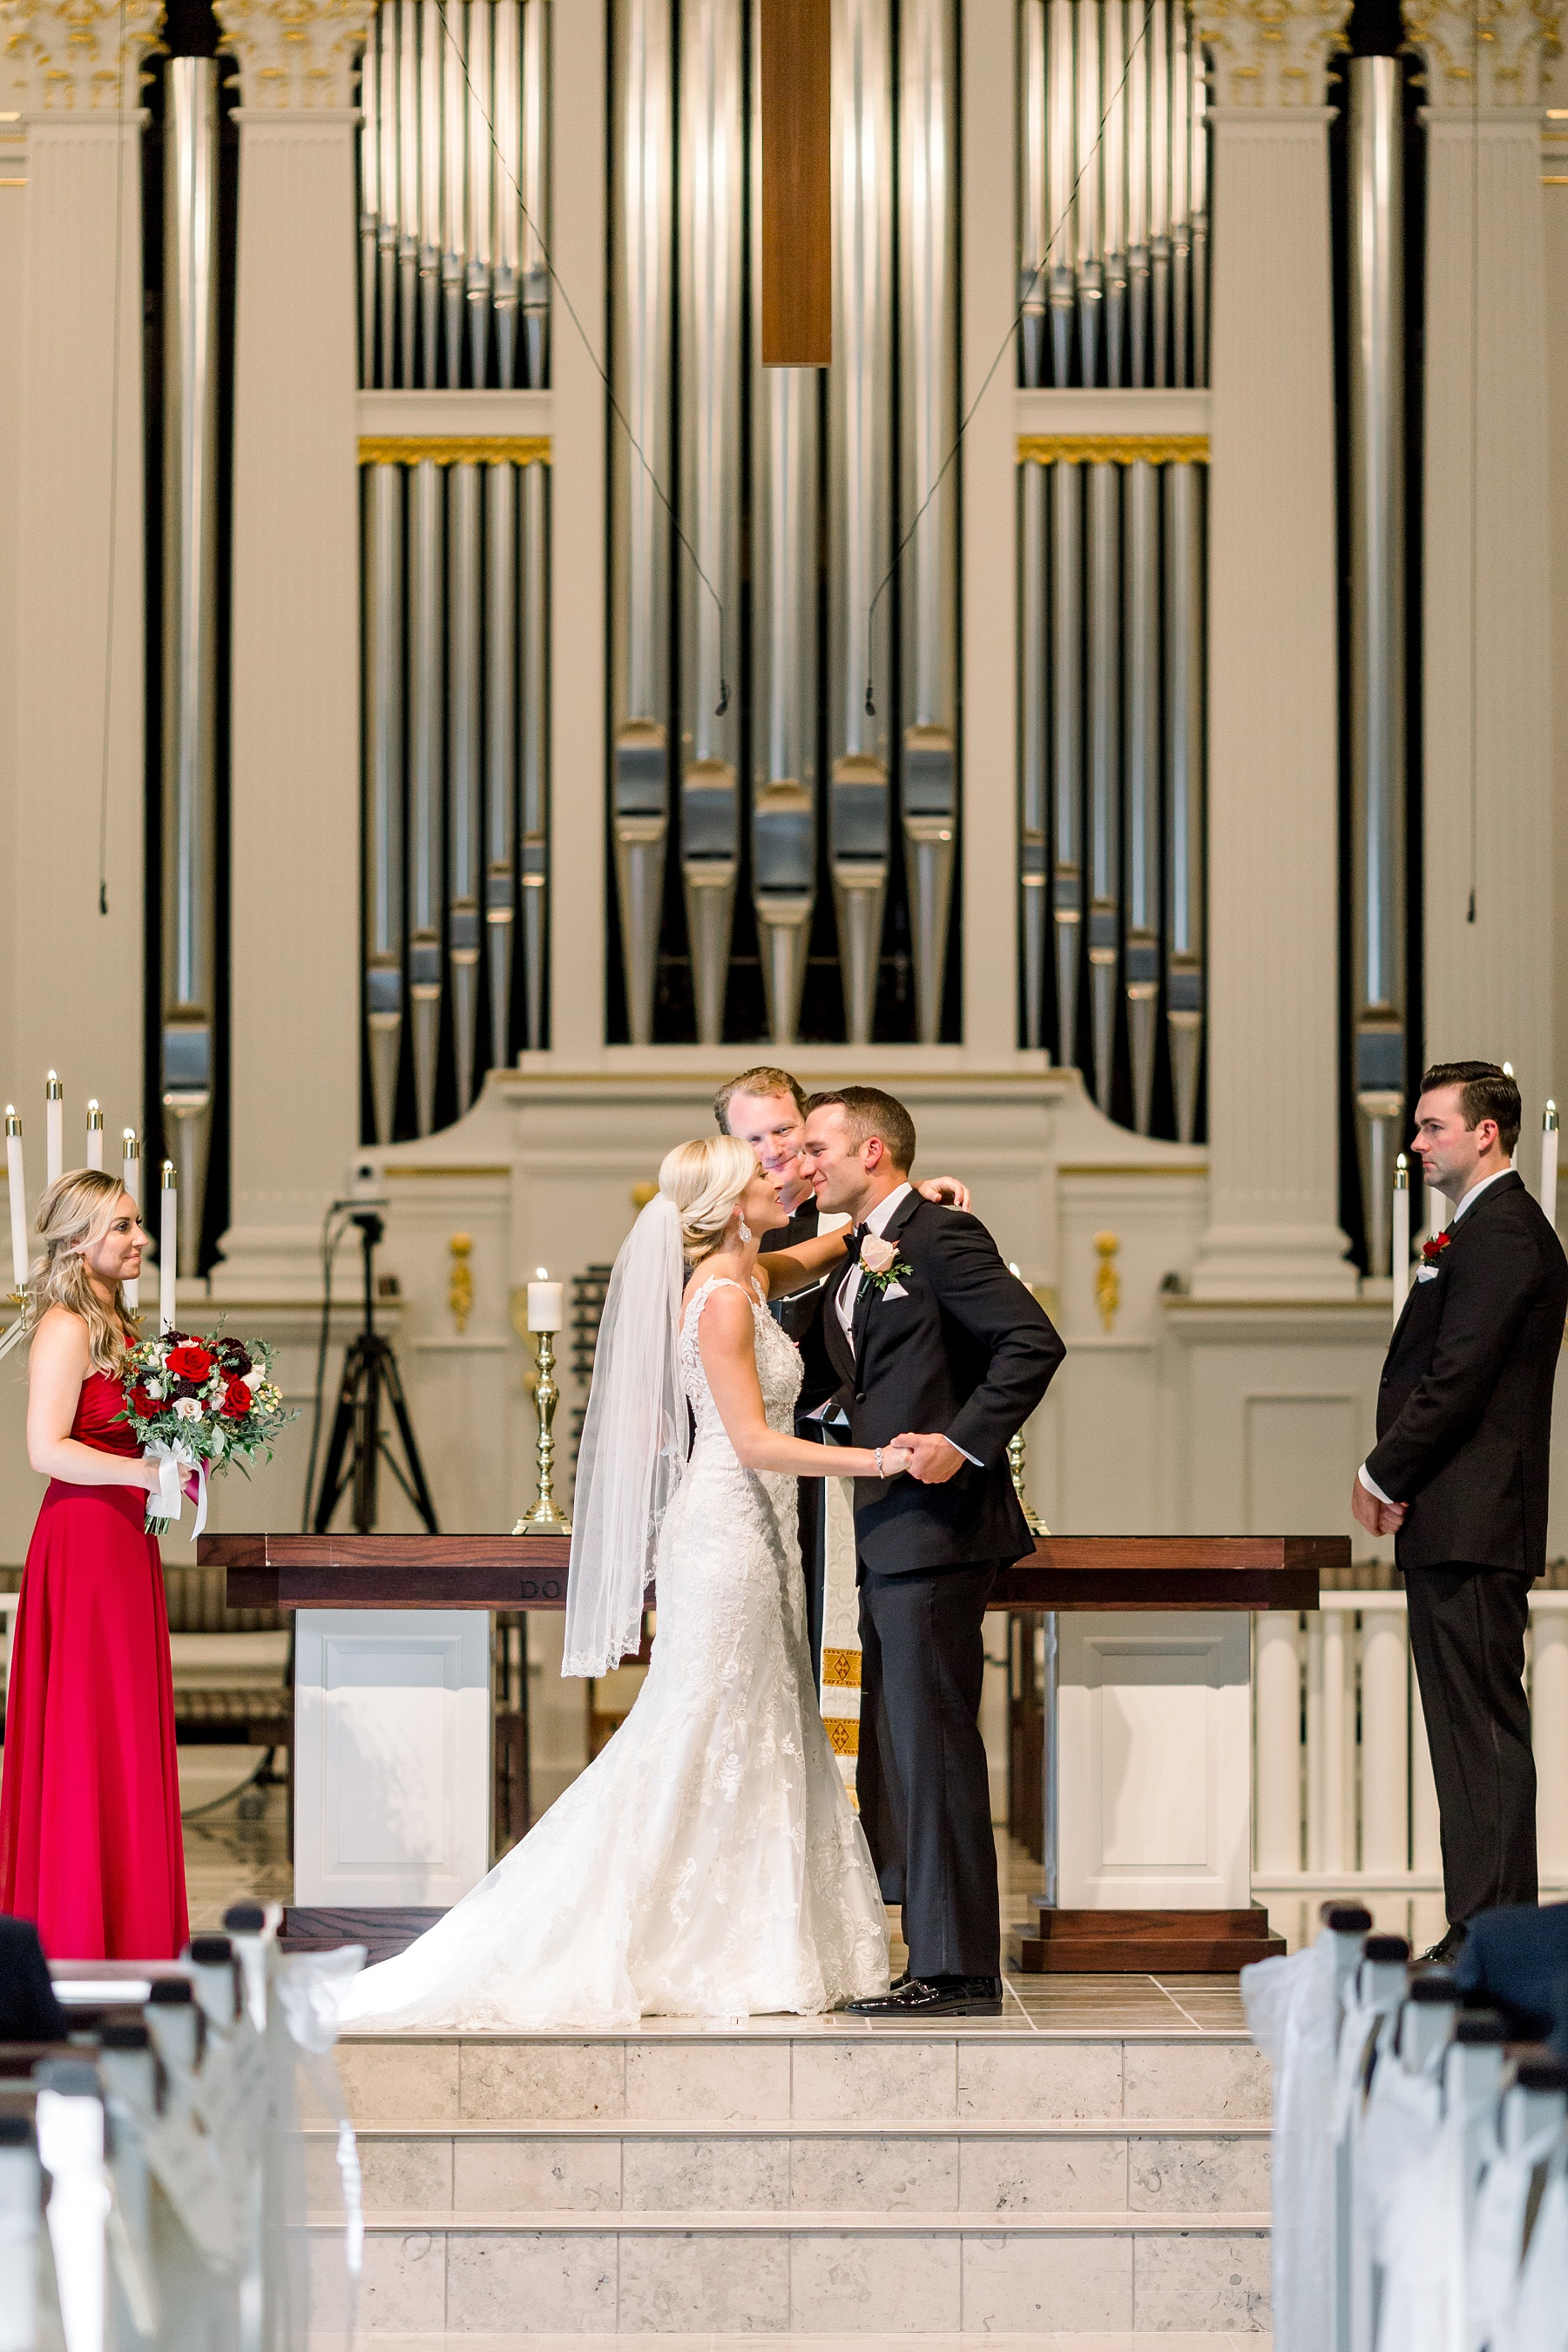 midwest-adventurous-wedding-photographer-elizabeth-ladean-photography-photo_4779.jpg